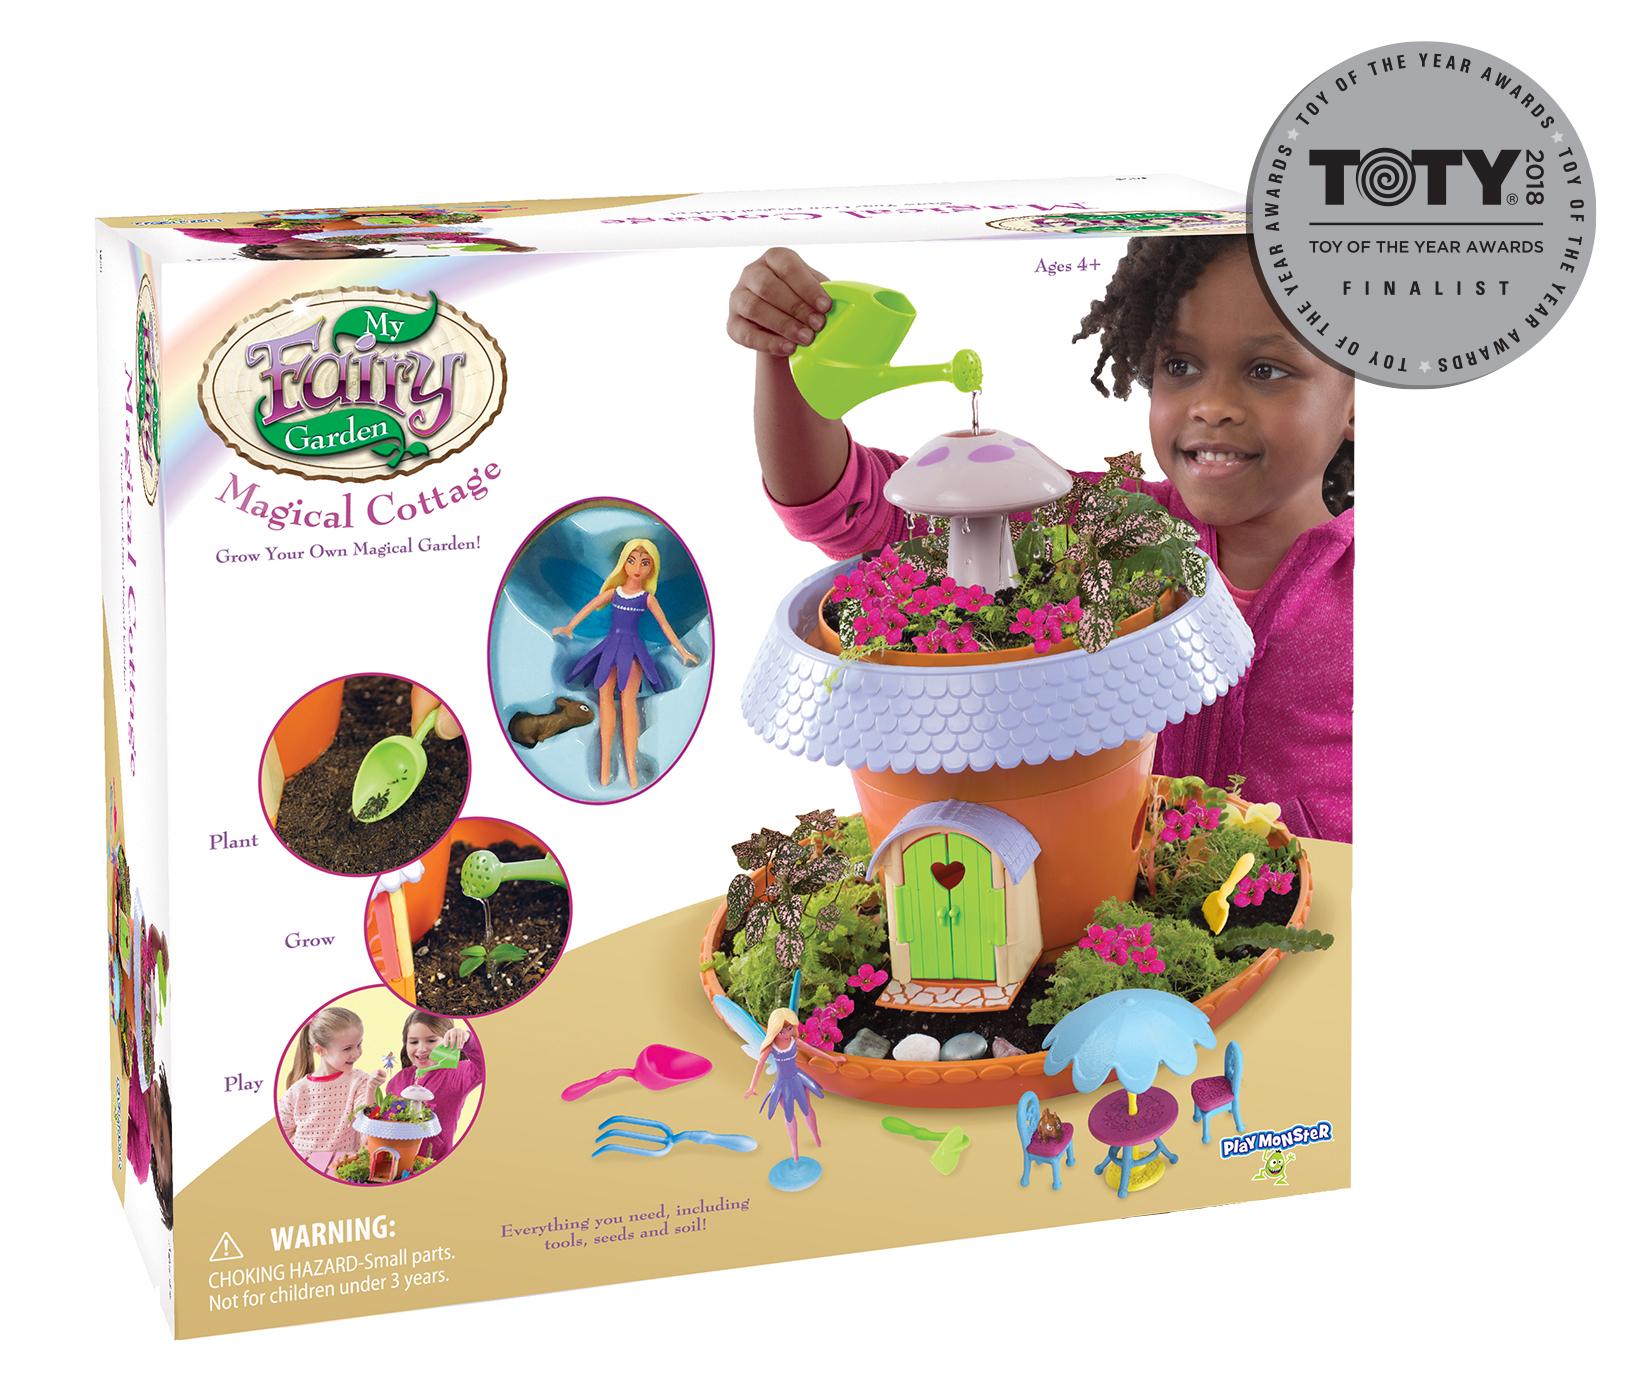 My Fairy Garden Magical Cottage Playmonster